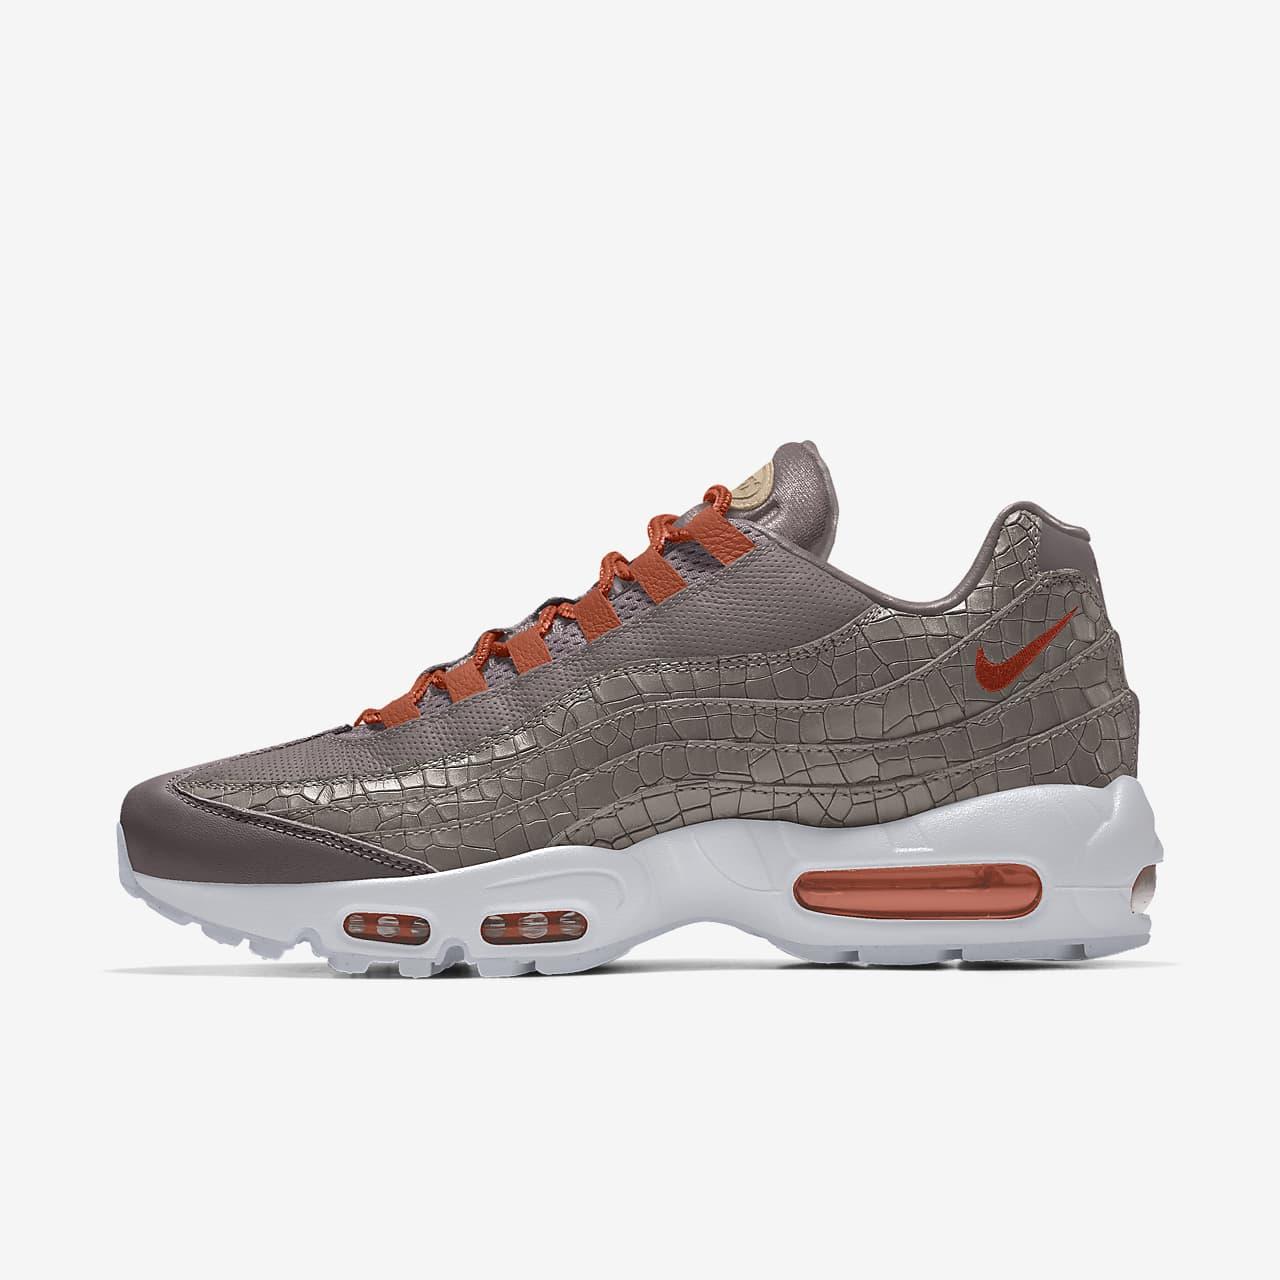 Nike Air Max 95 Premium By You personalisierbarer Schuh